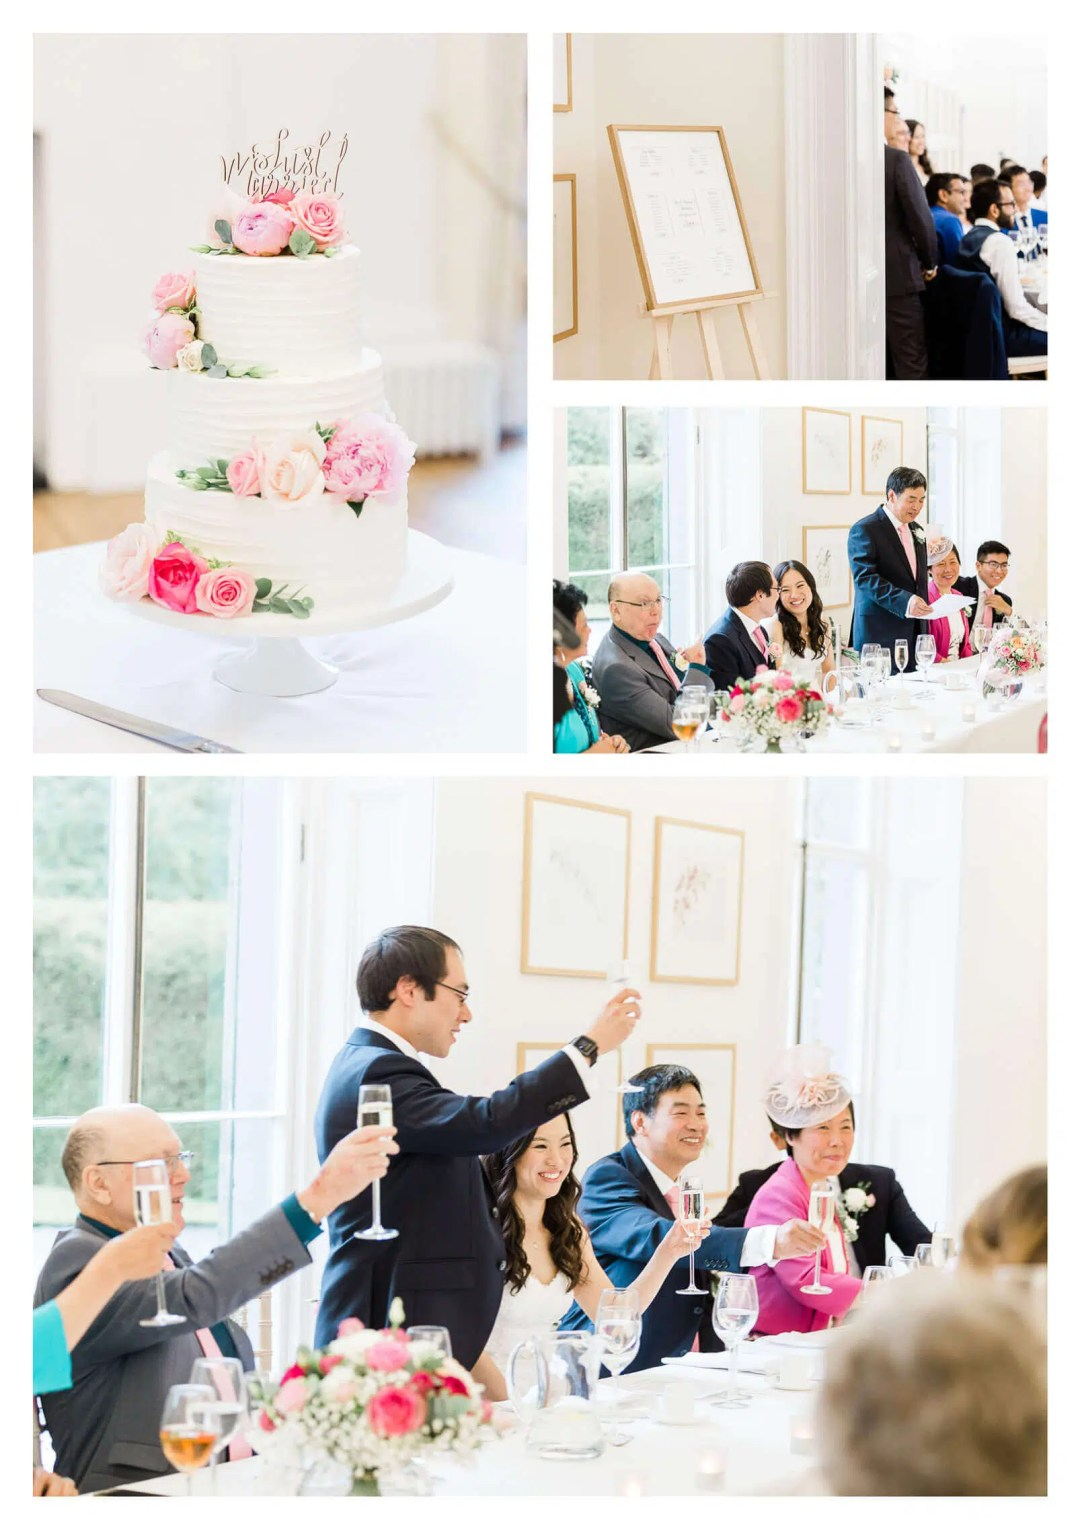 Cambridge Cottage wedding breakfast | Kew Gardens wedding photographer